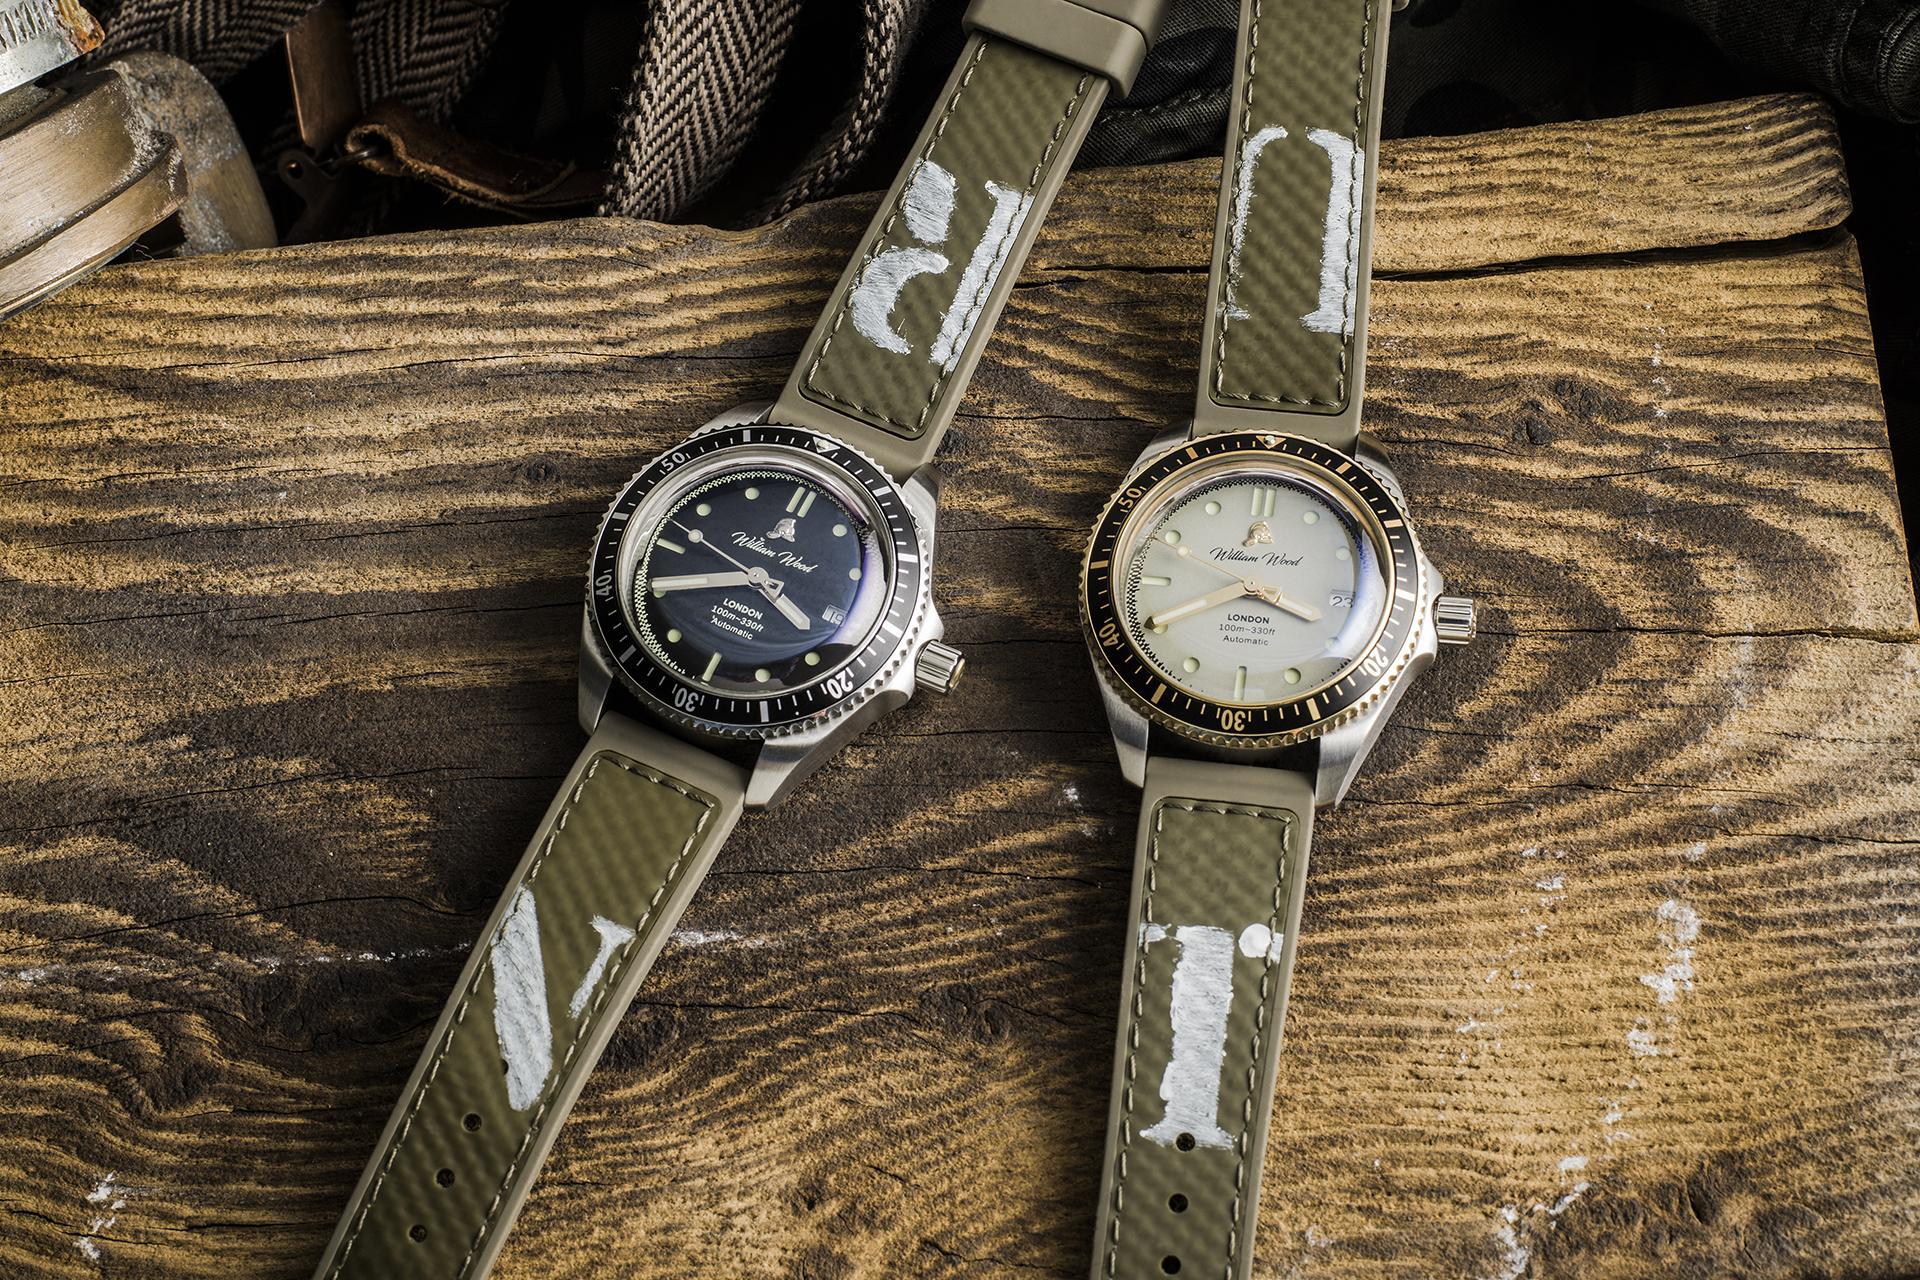 William Wood – Valiant watch range